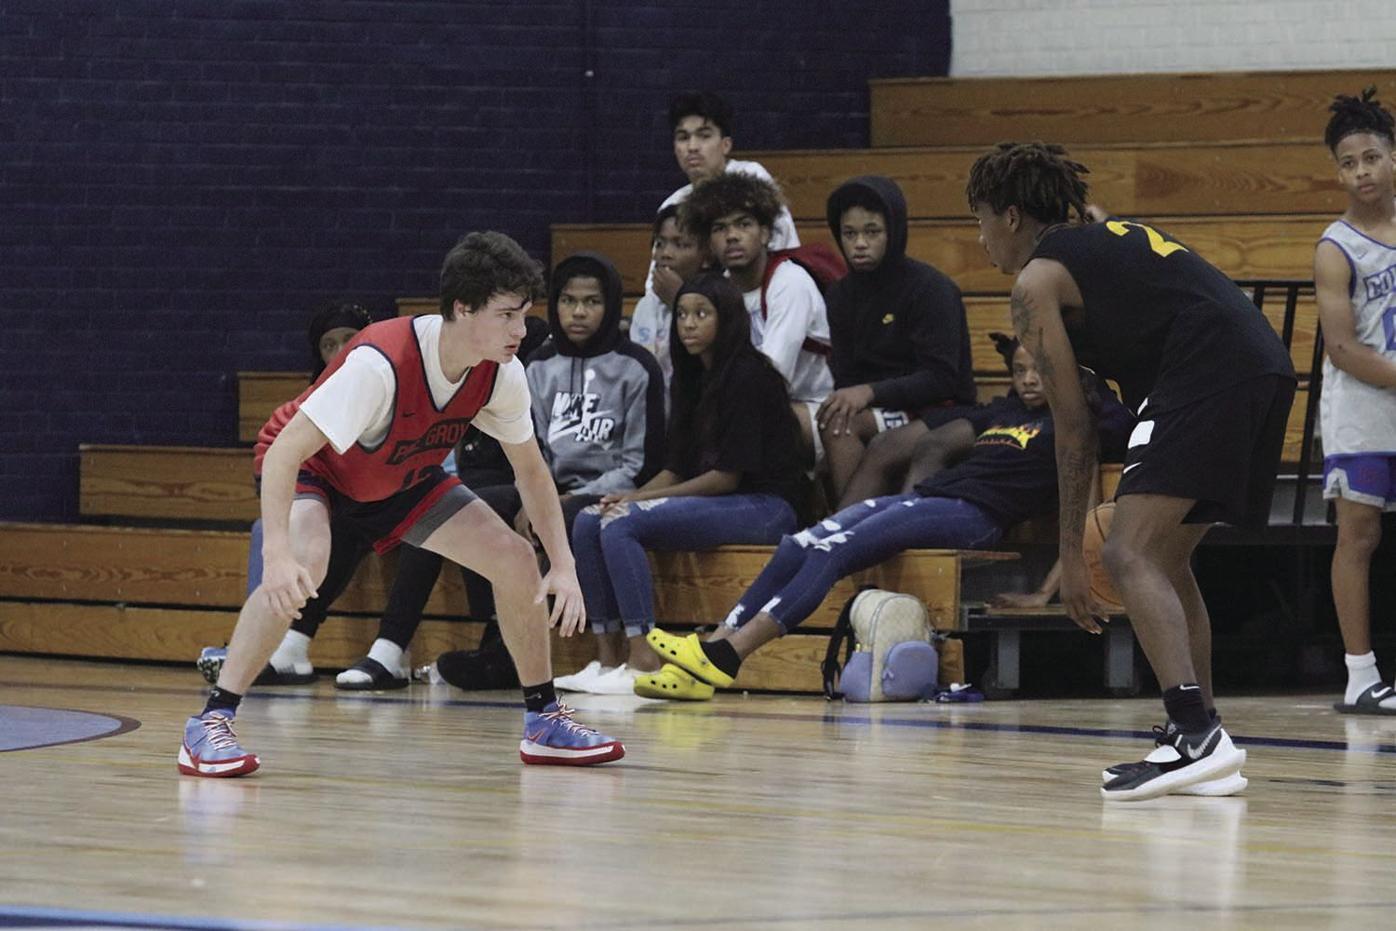 rip-2021-06-09-sports-bmcbasketball-2